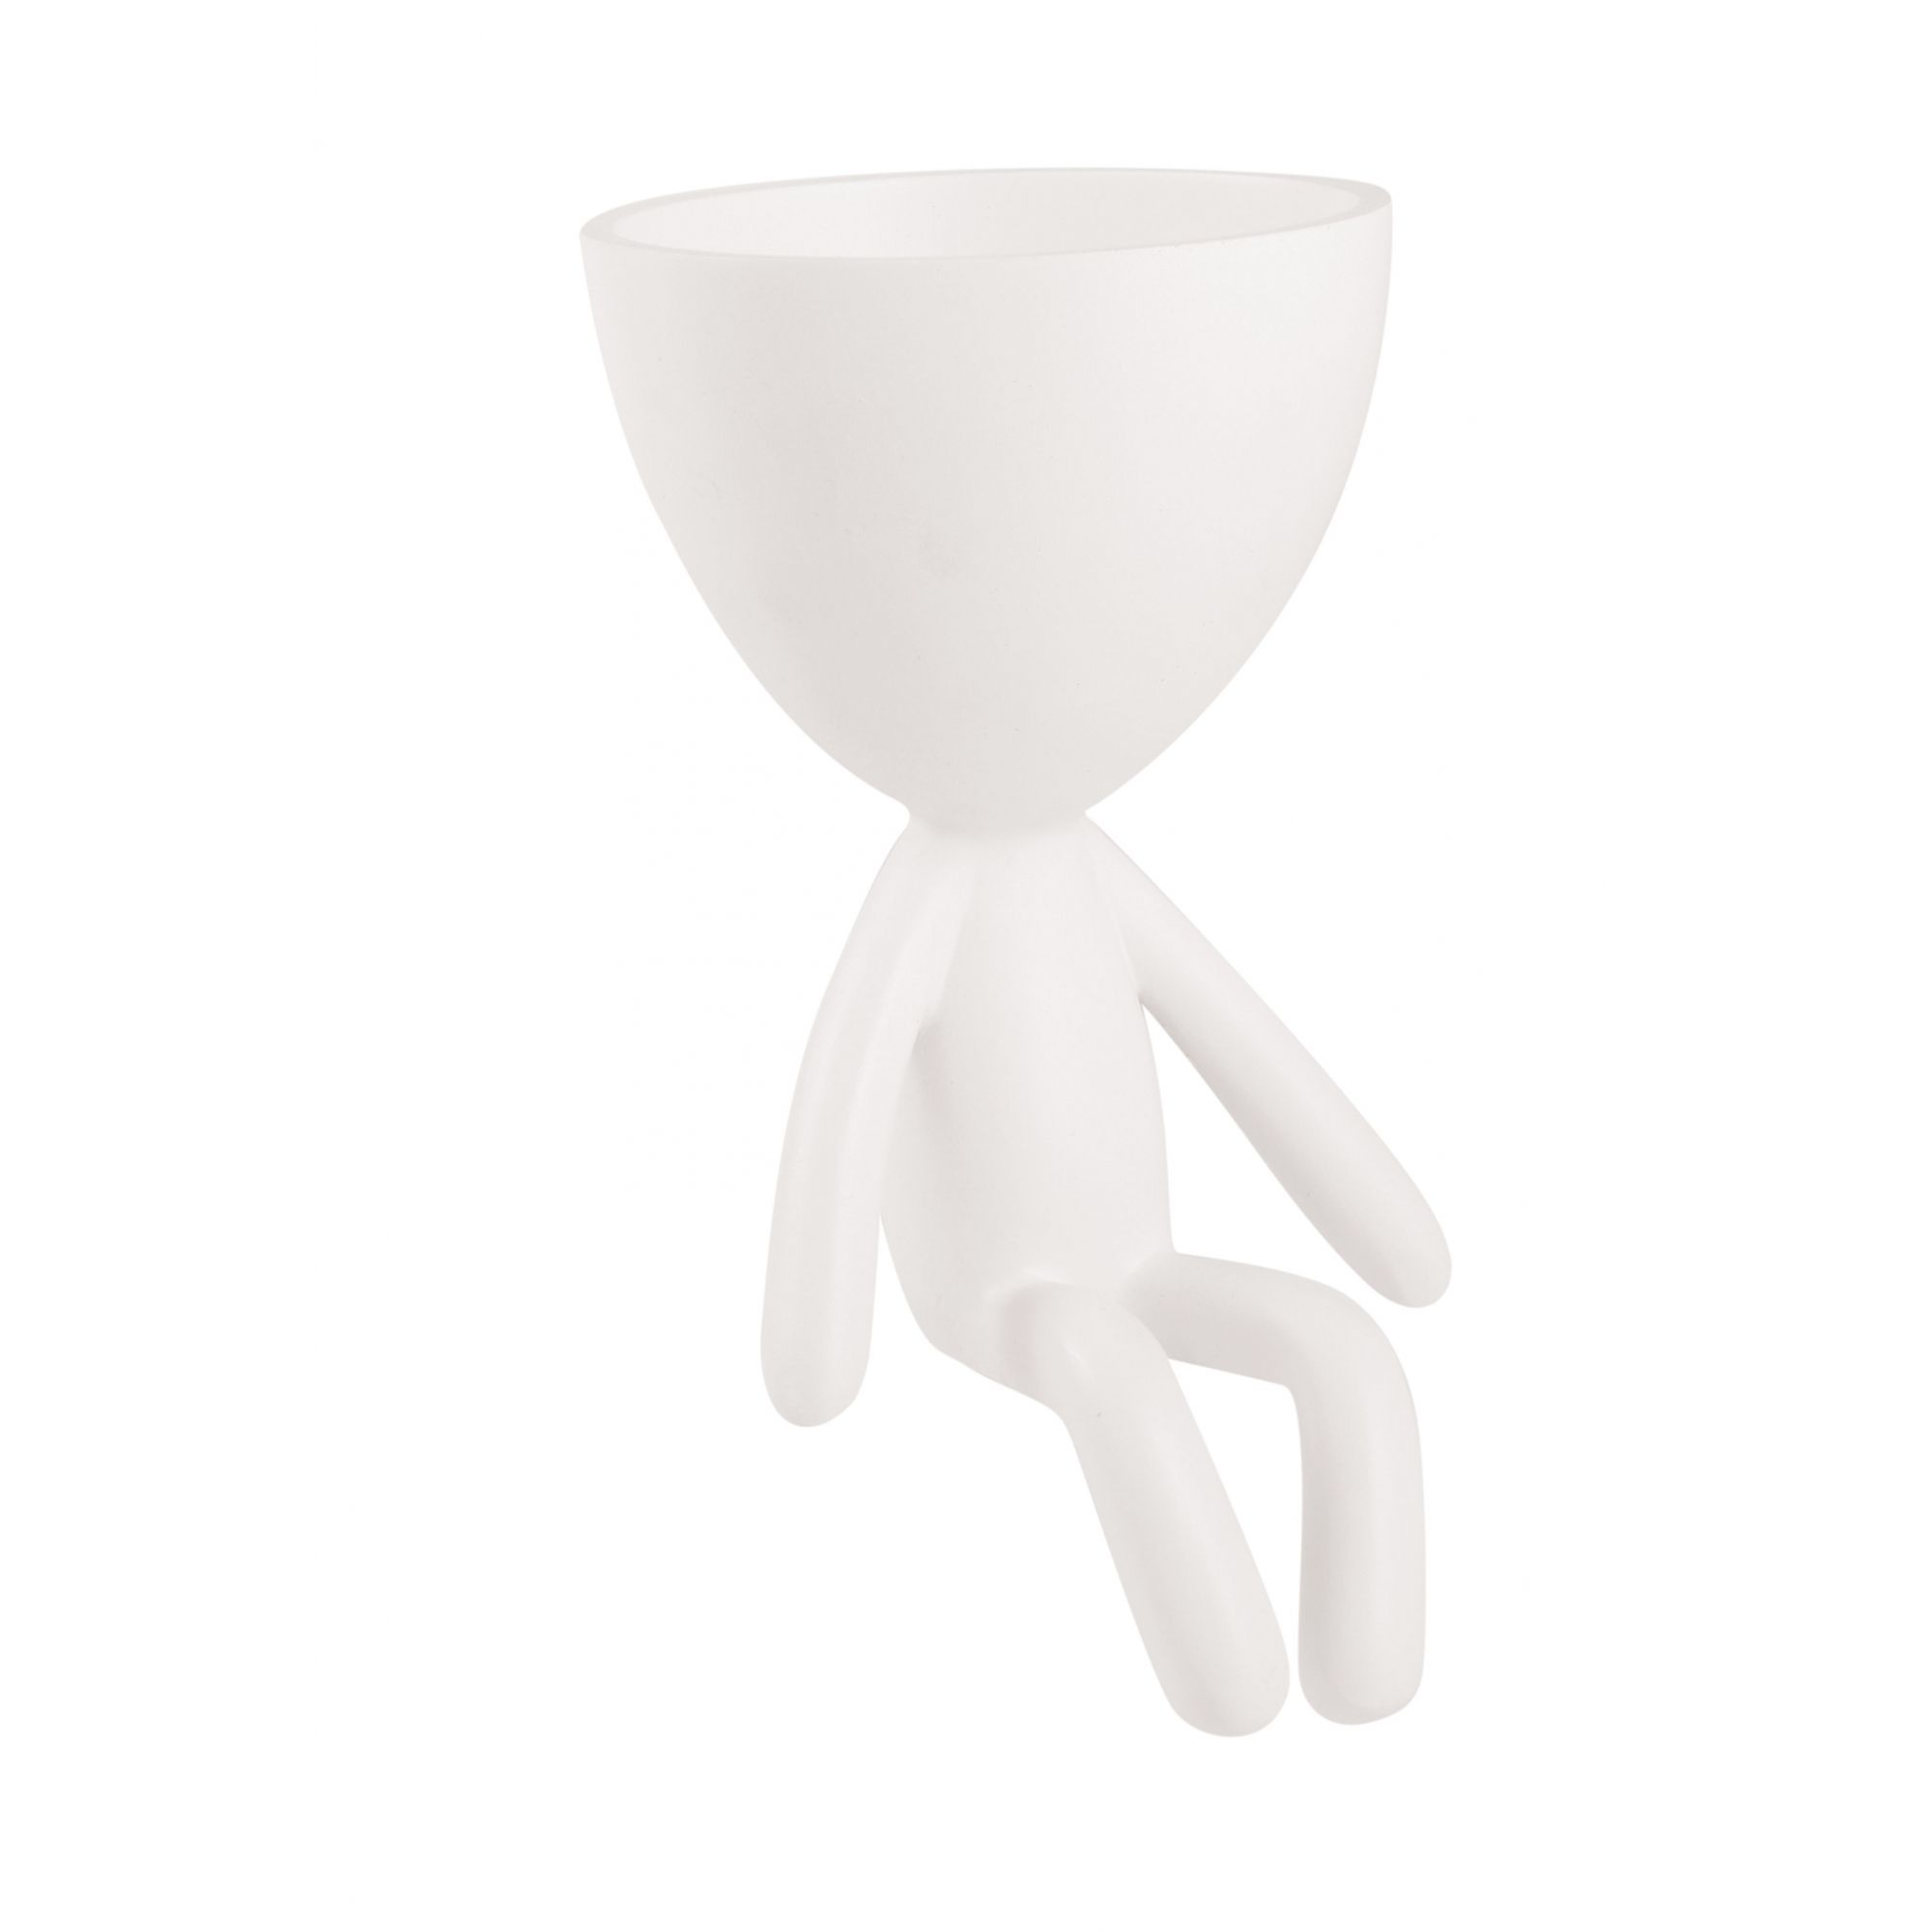 Vaso Boneco Em Poliresina Branco Sentado